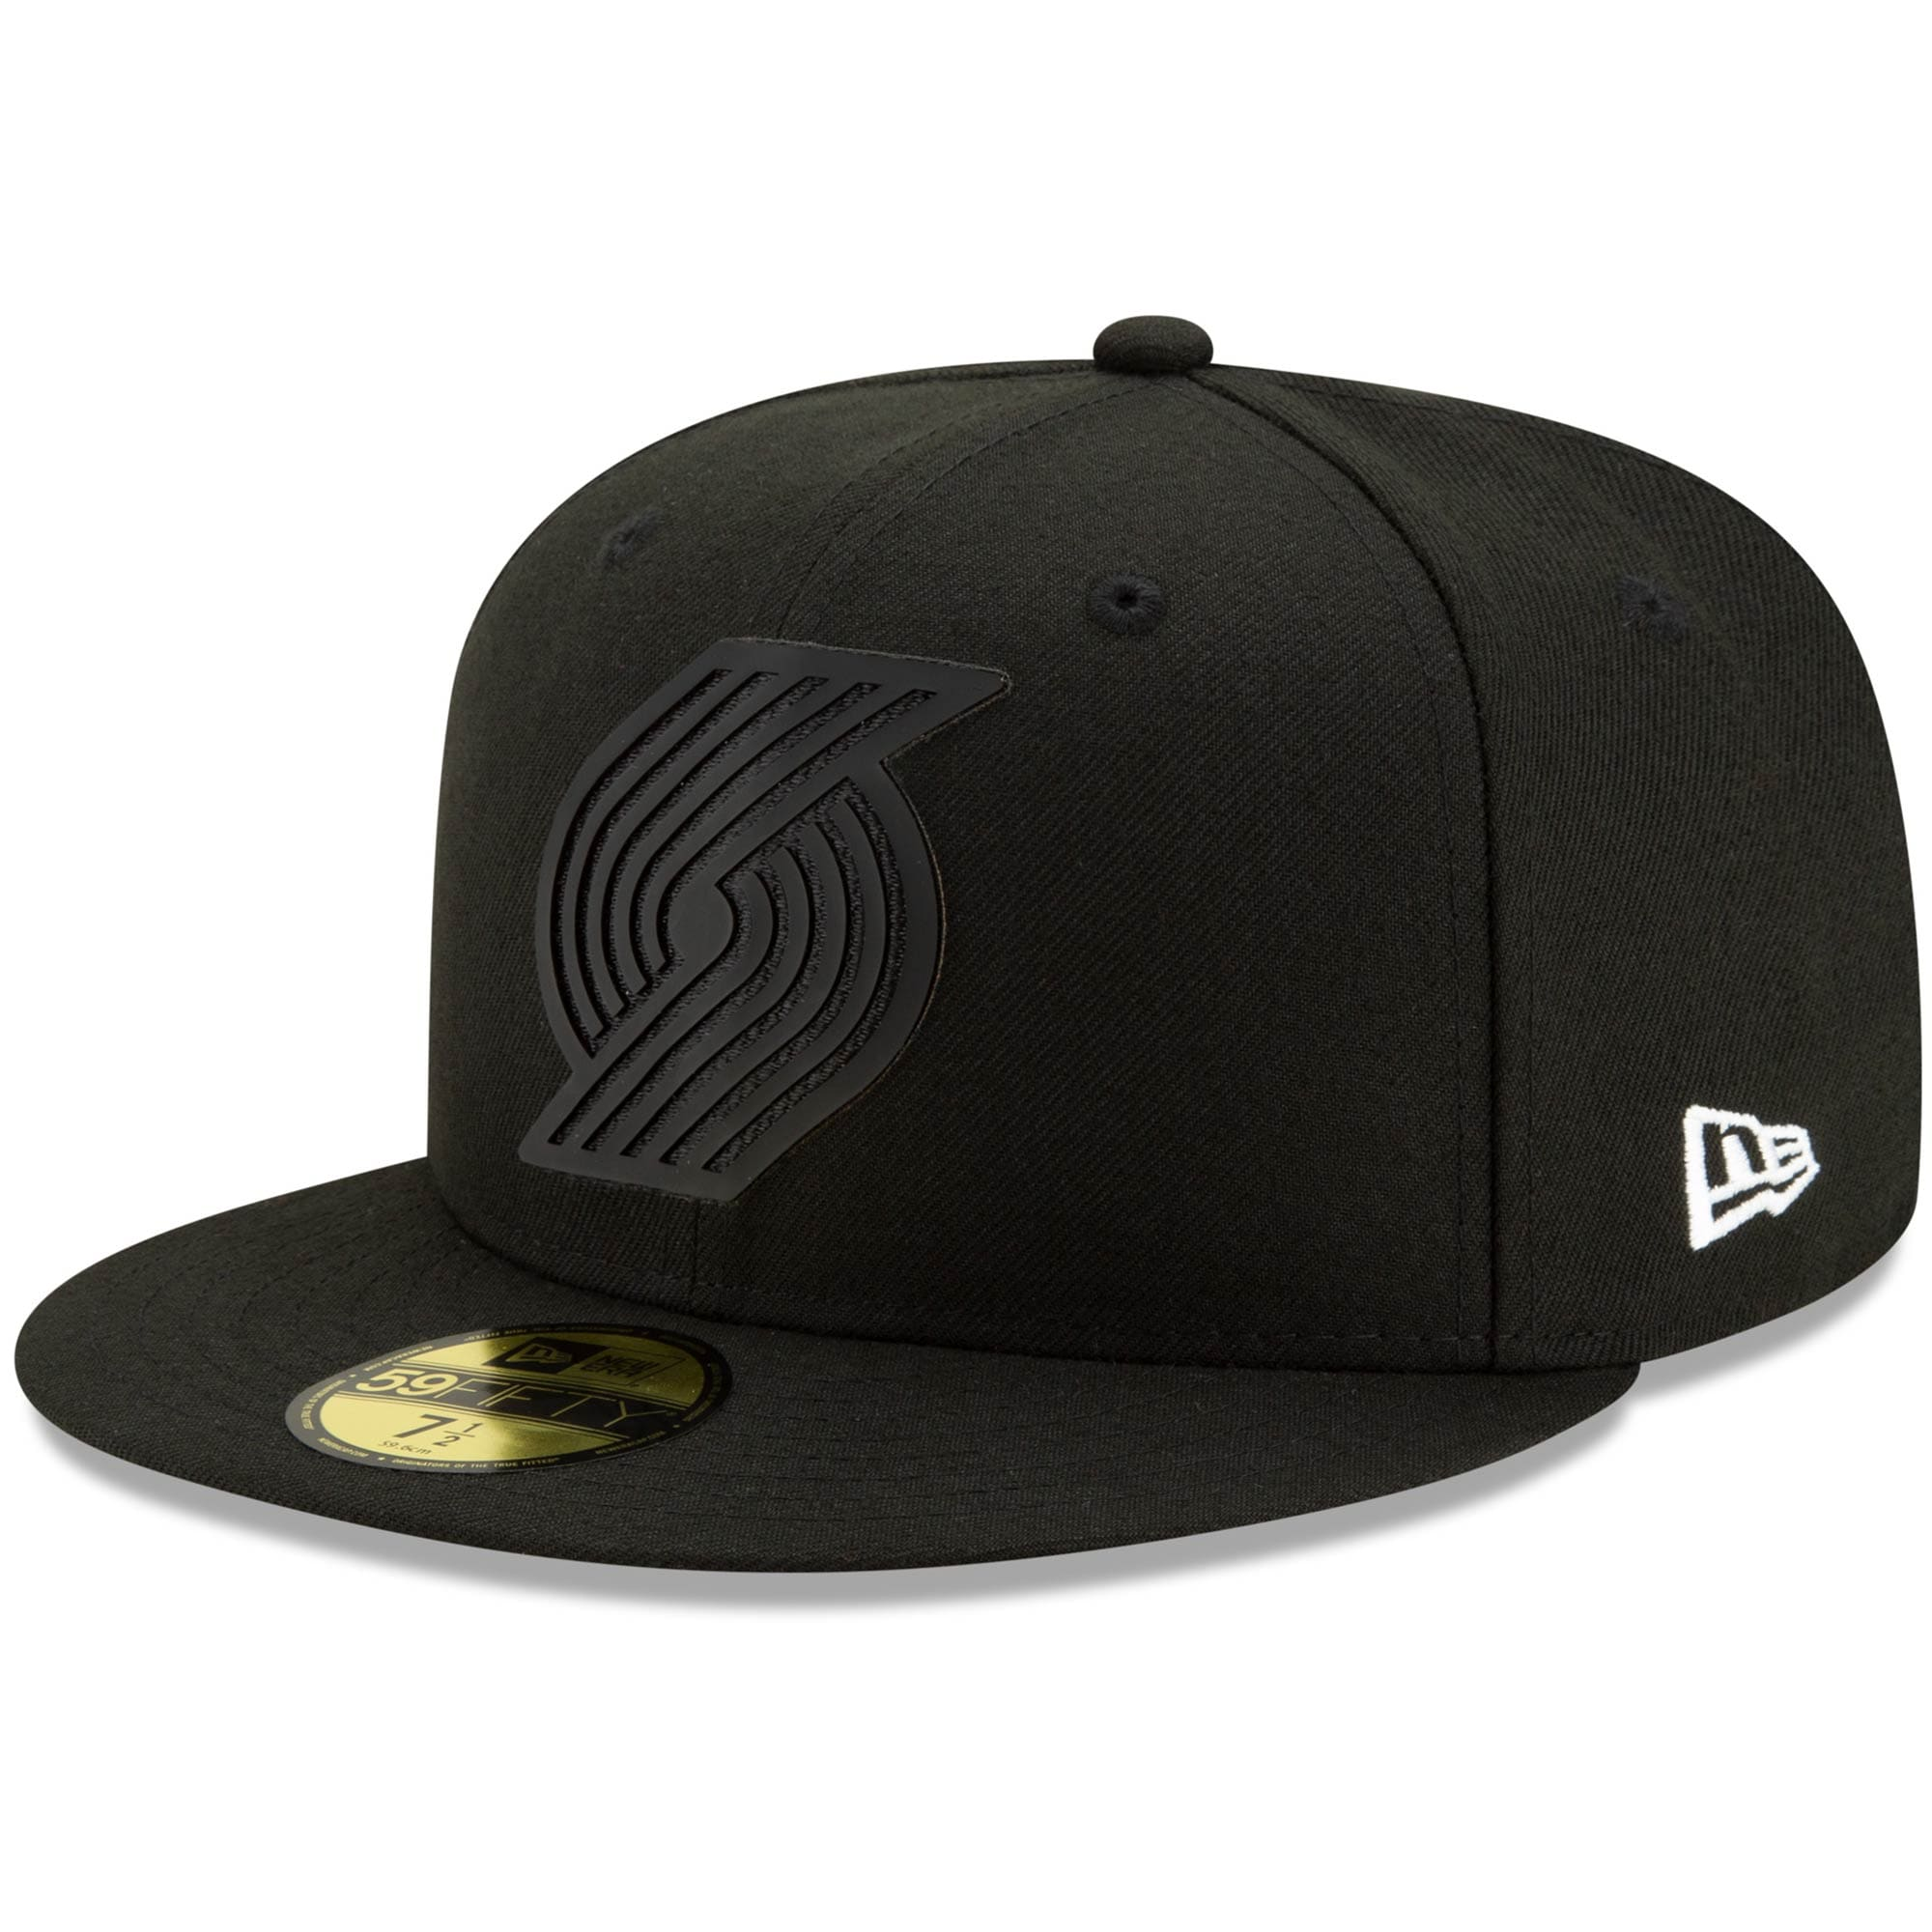 Portland Trail Blazers New Era Back Half 59FIFTY Fitted Hat - Black